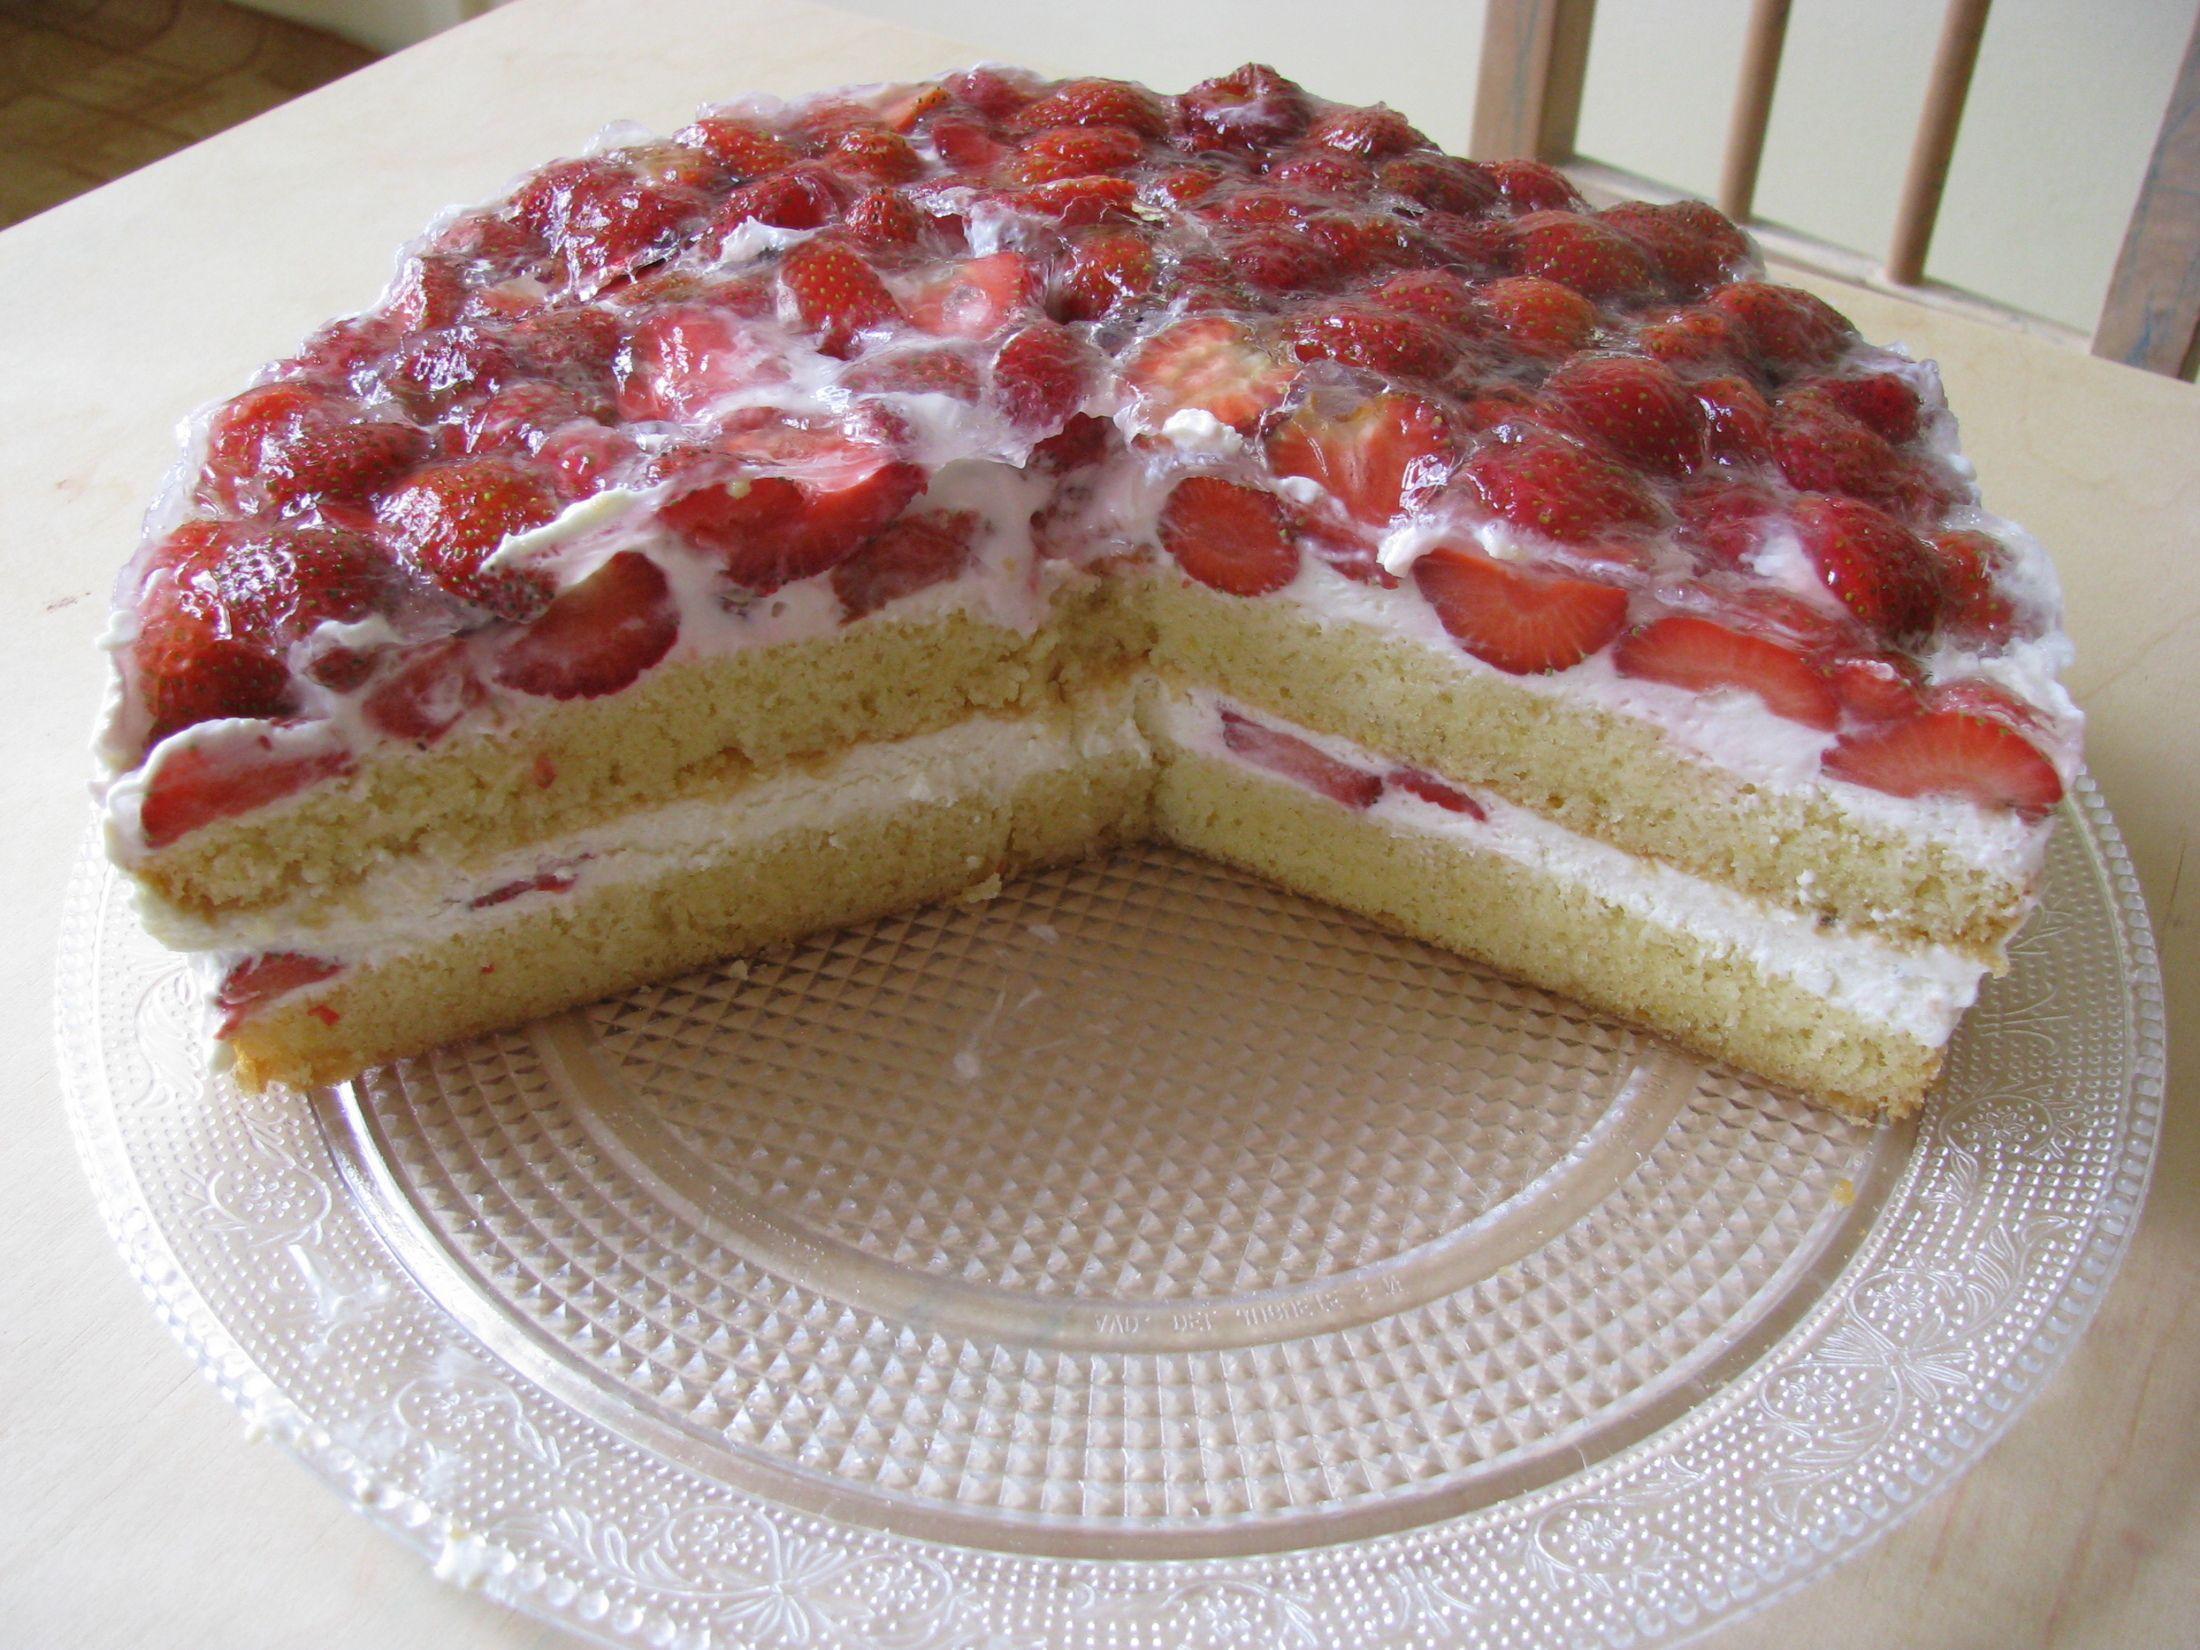 Recept Tvarohovo-jahodový dort - Rozkrojený dort